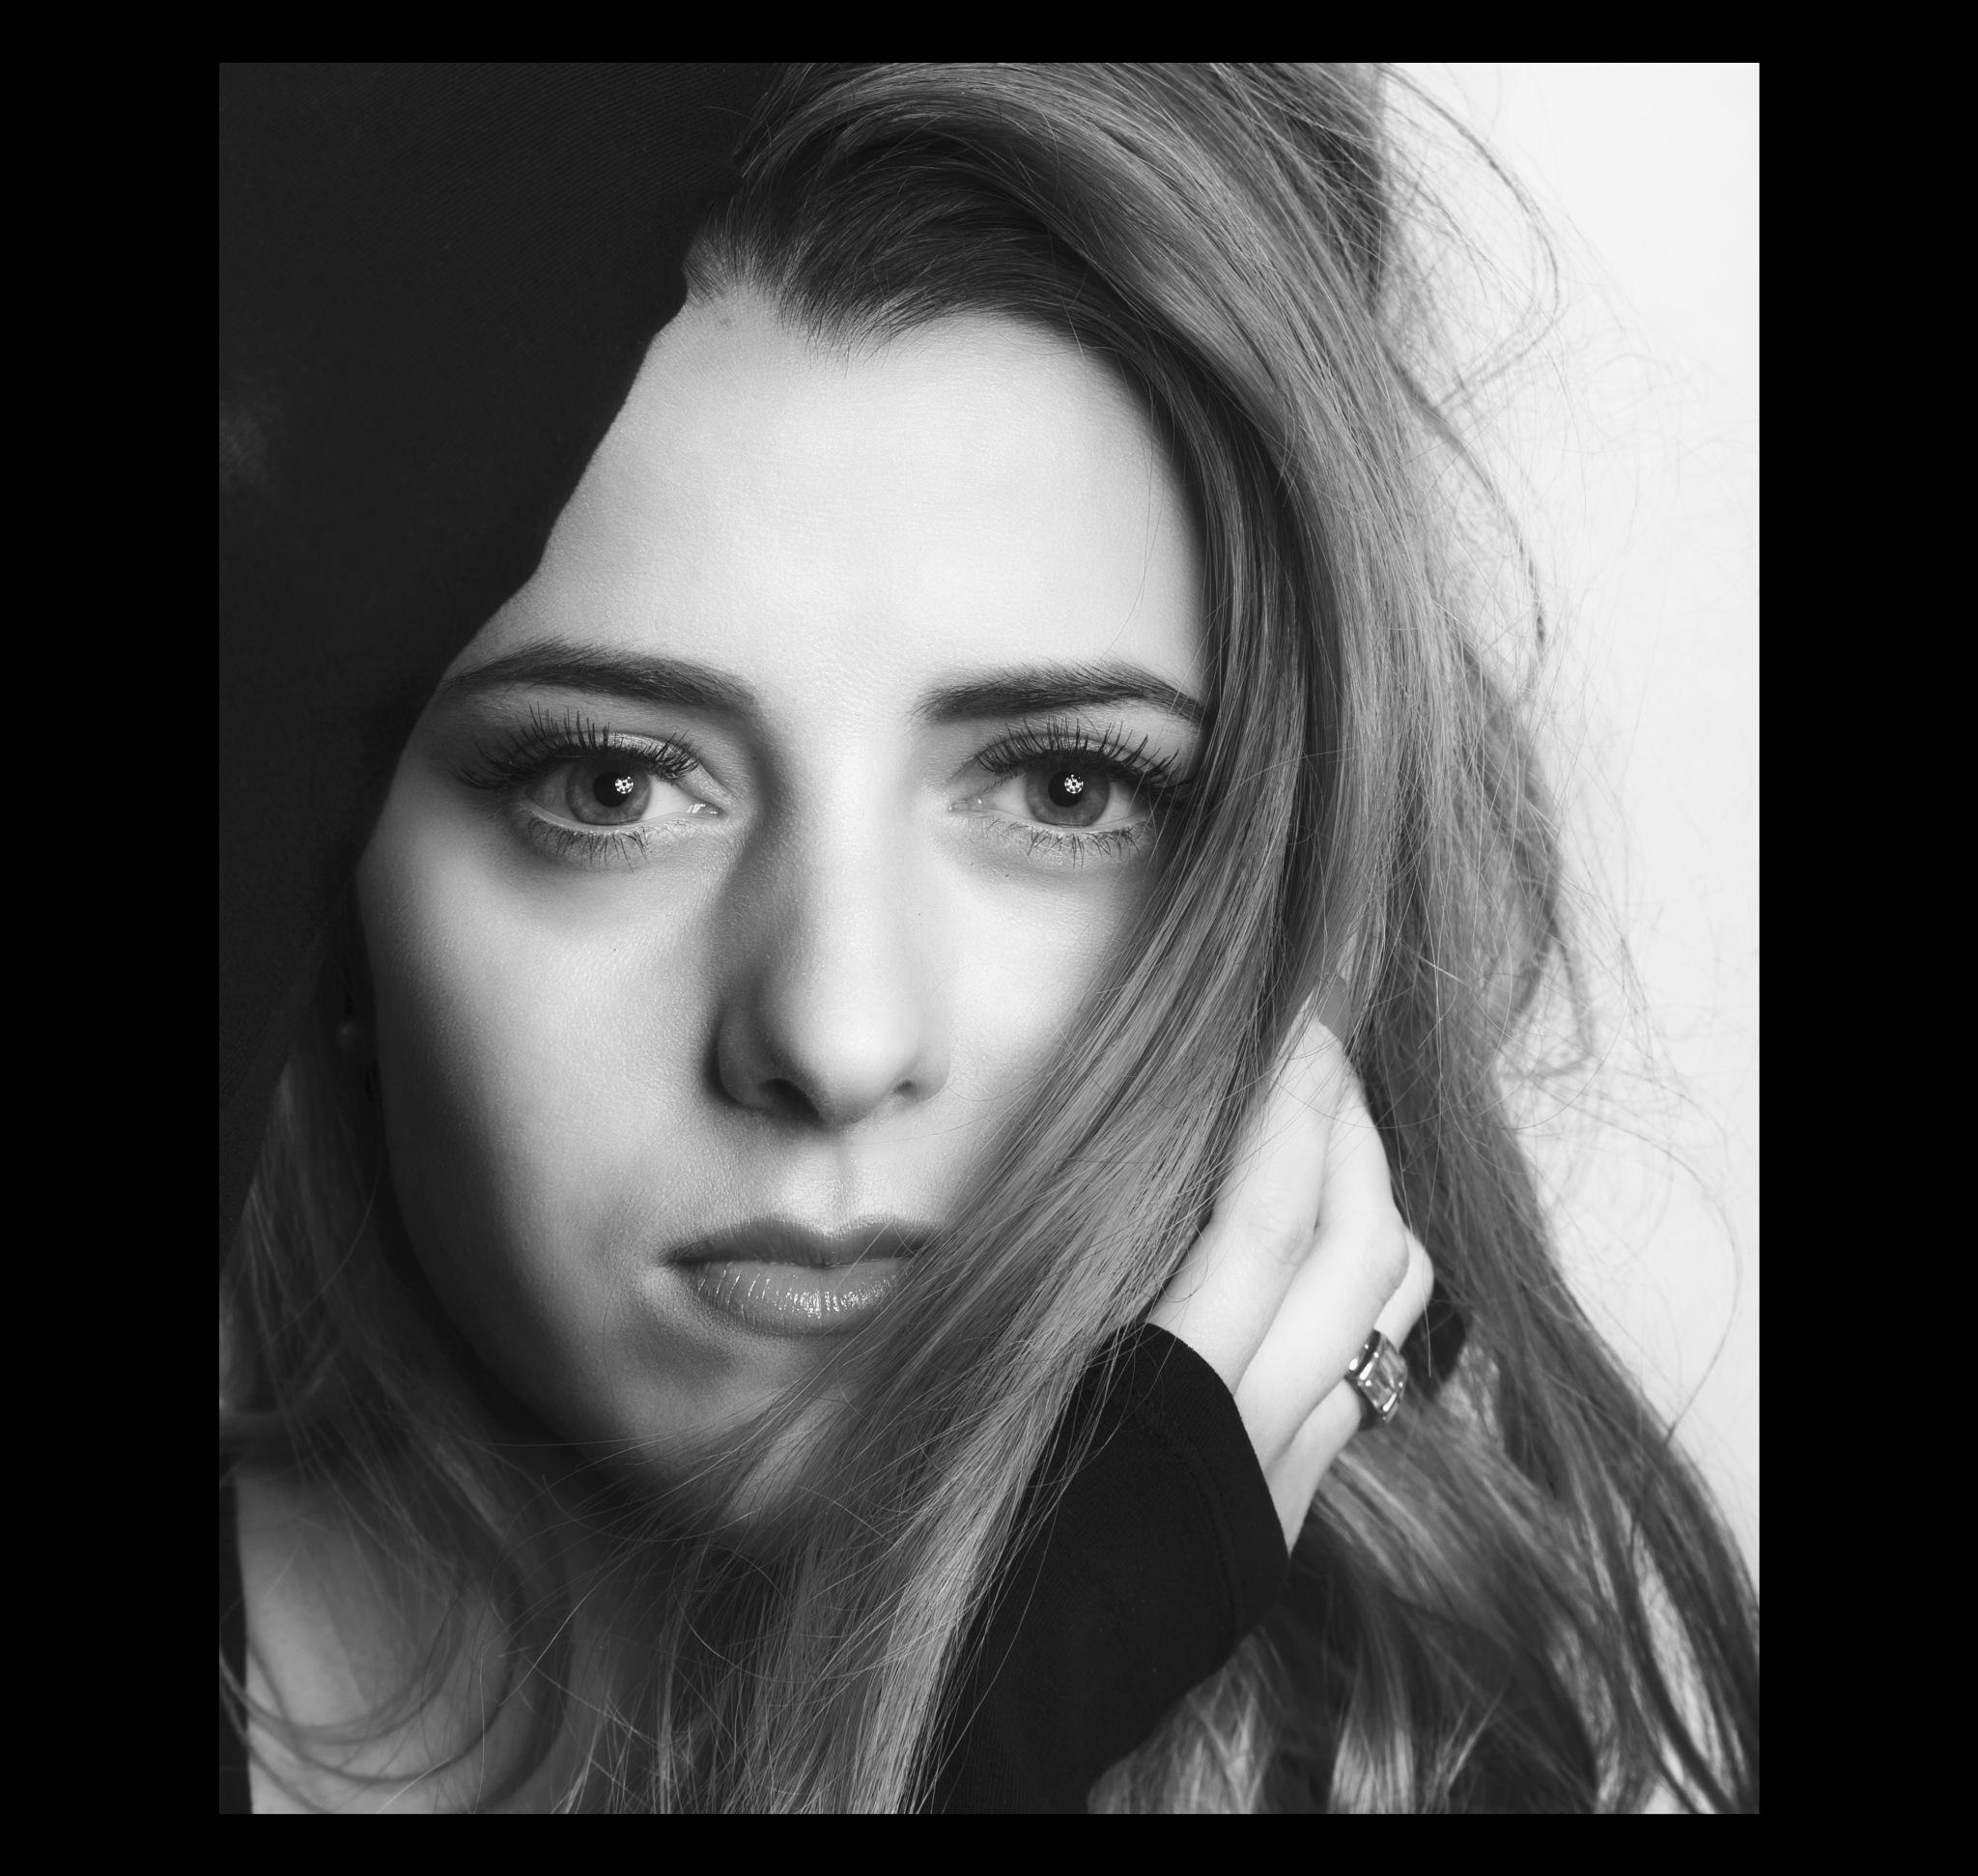 studio portrait 2 by Tavi Ionescu